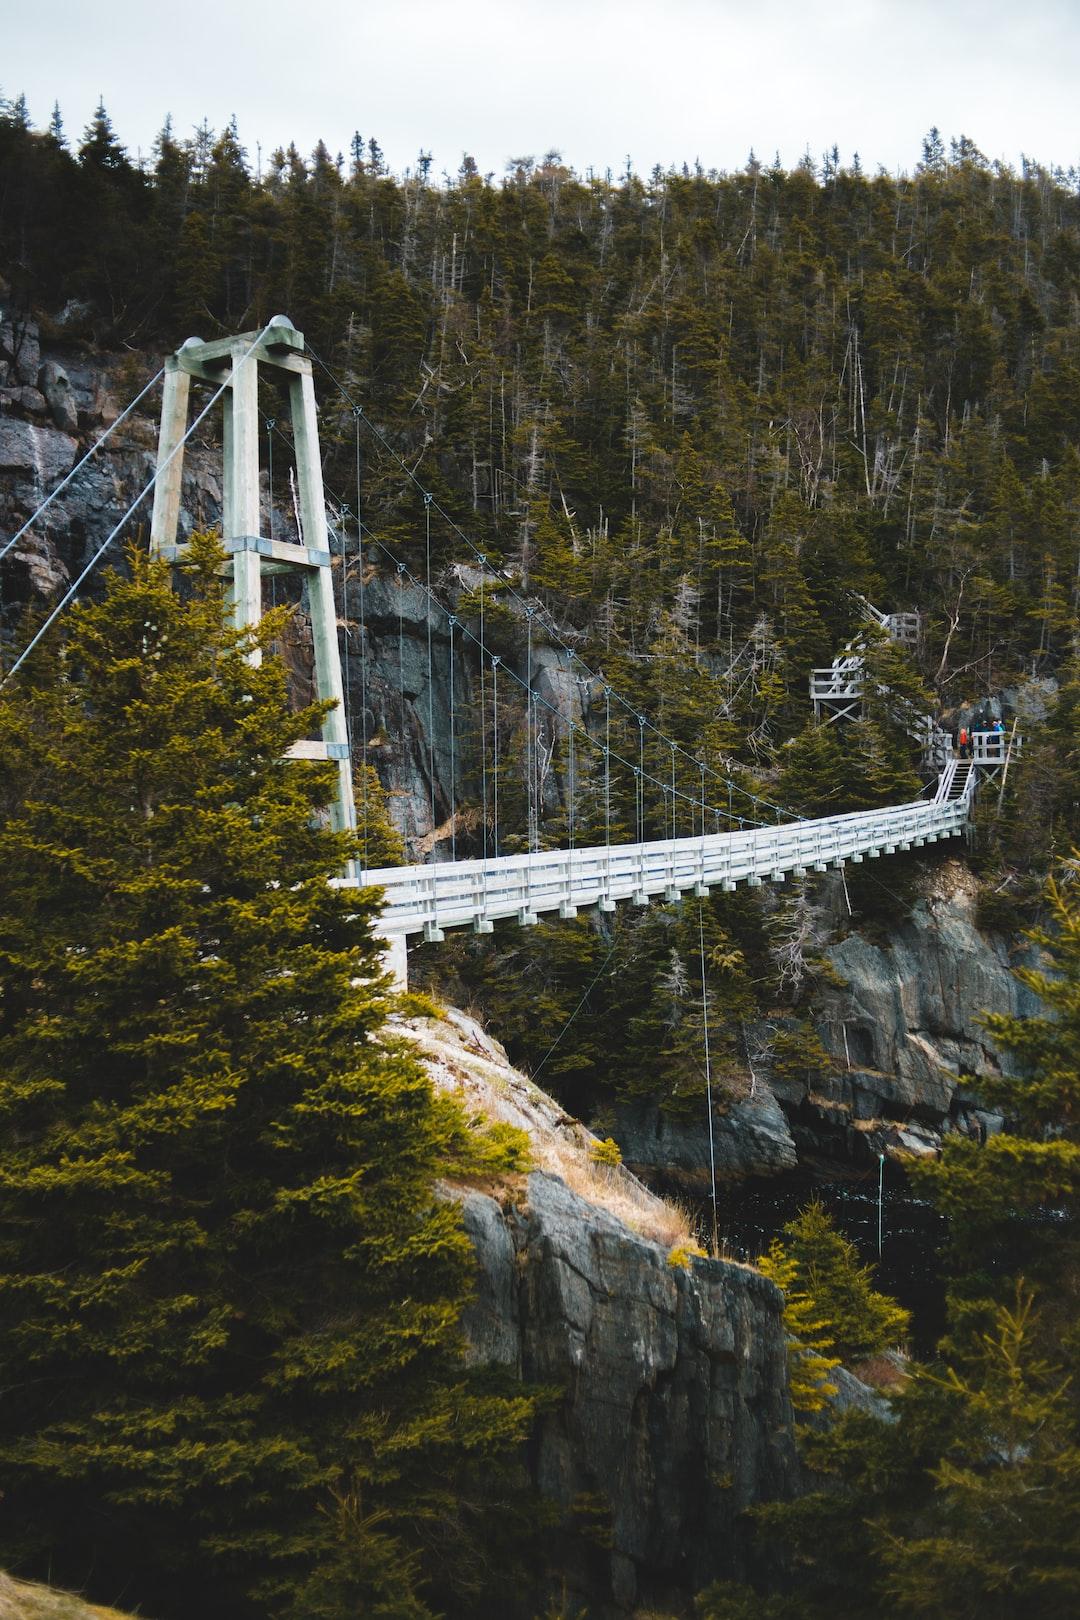 La manche provincial park in Newfoundland